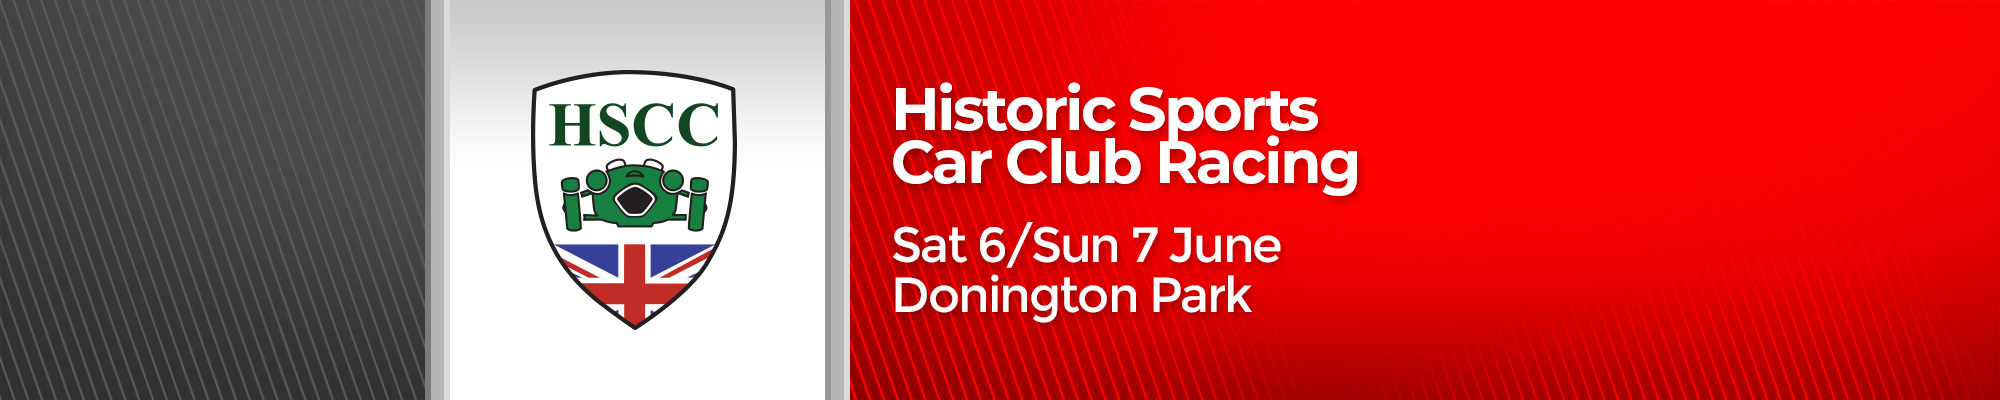 HSCC Historic Car Championships - POSTPONED